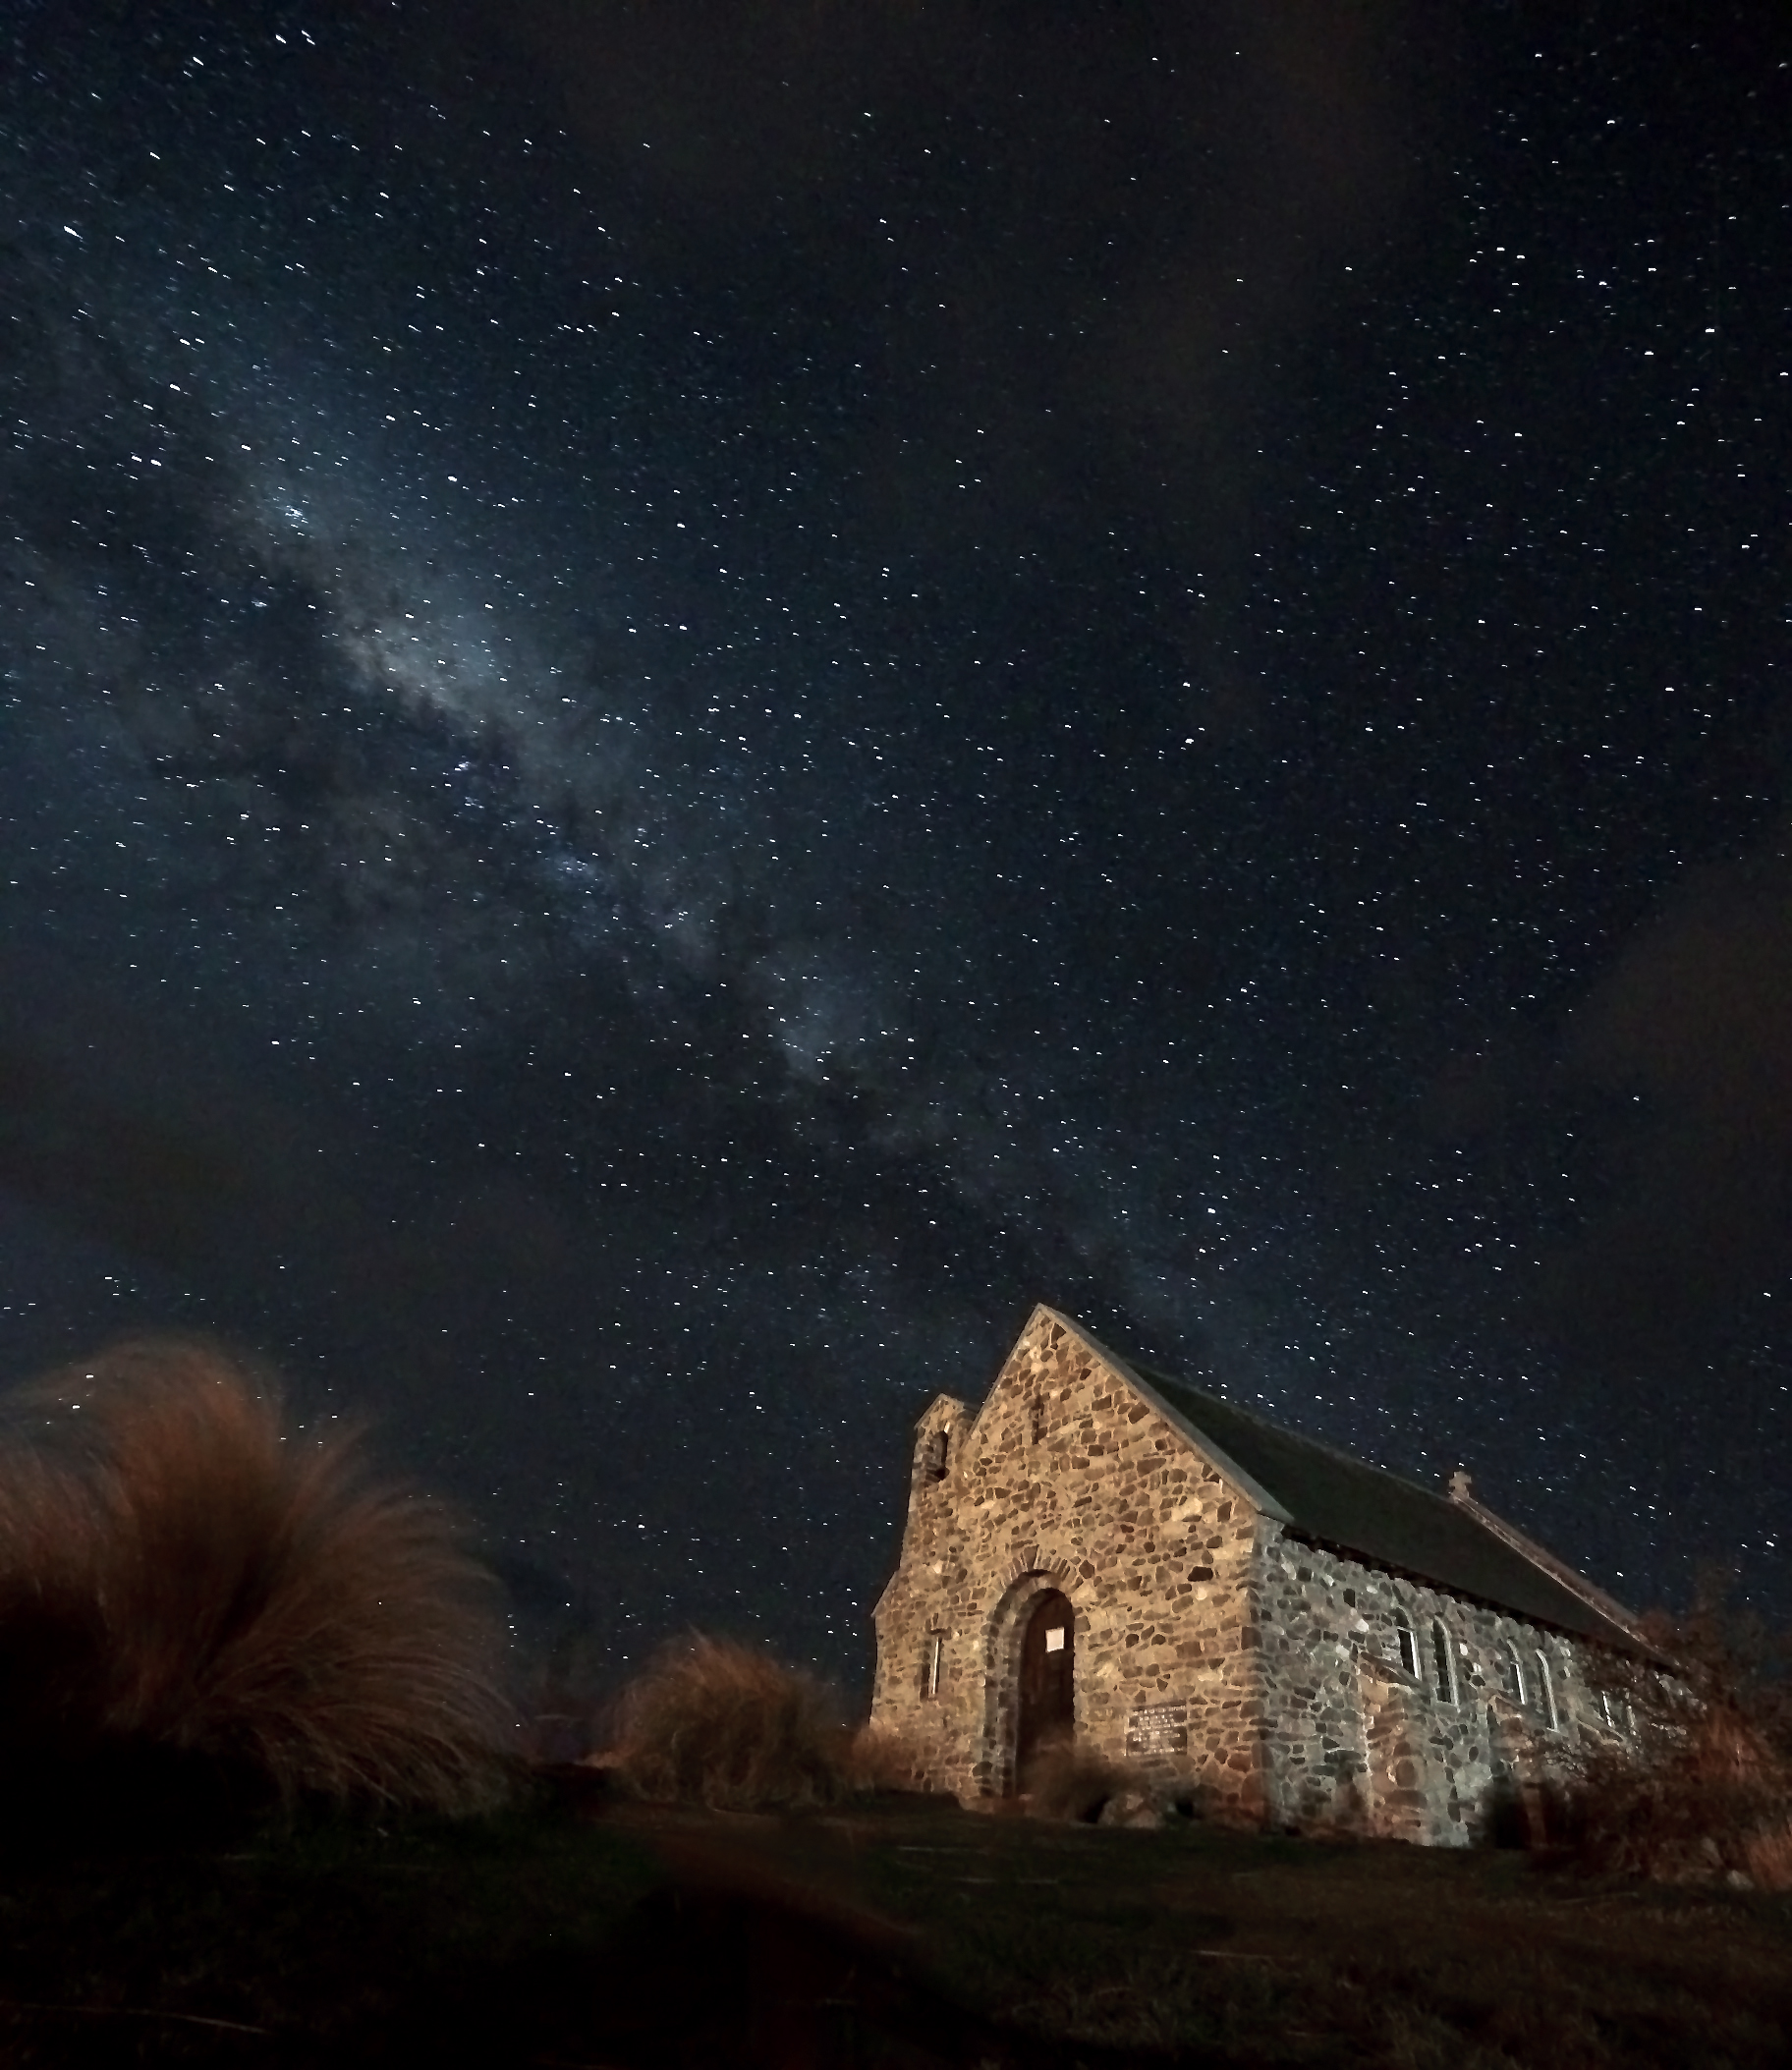 The Church of the Good Shepherd and the milky way of stars, Tekapo.